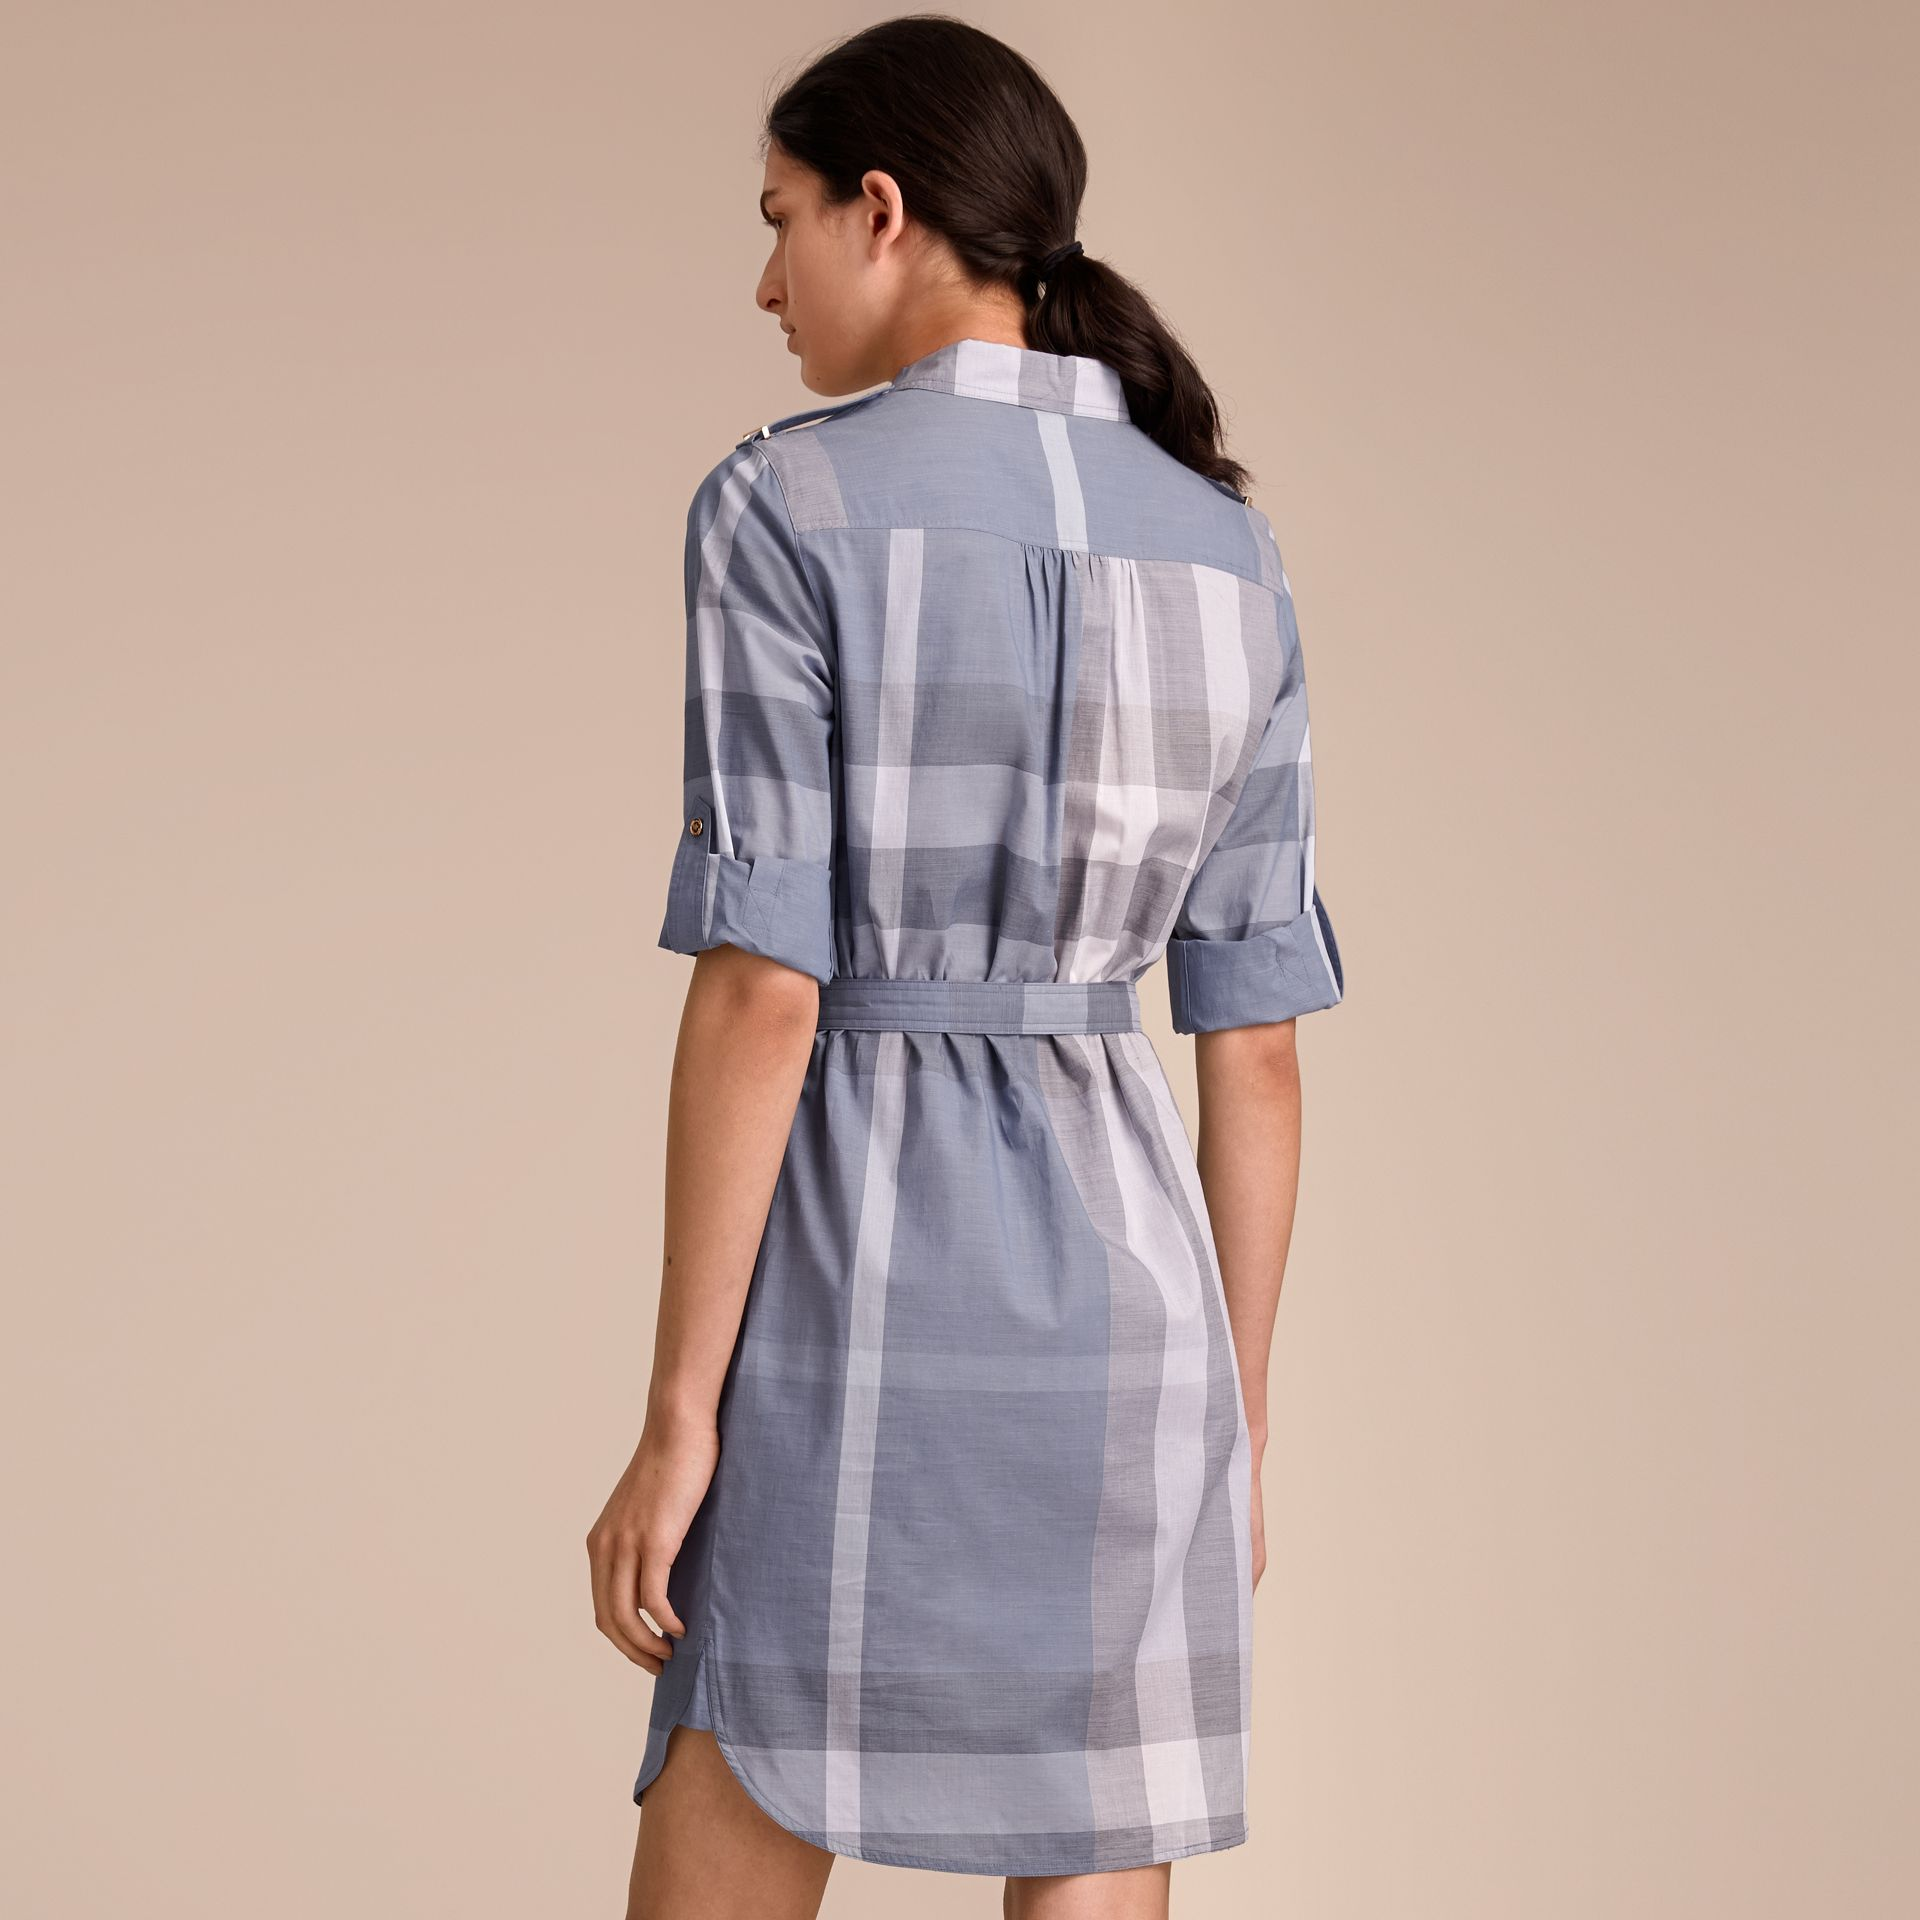 Tie-waist Check Cotton Shirt Dress - gallery image 3